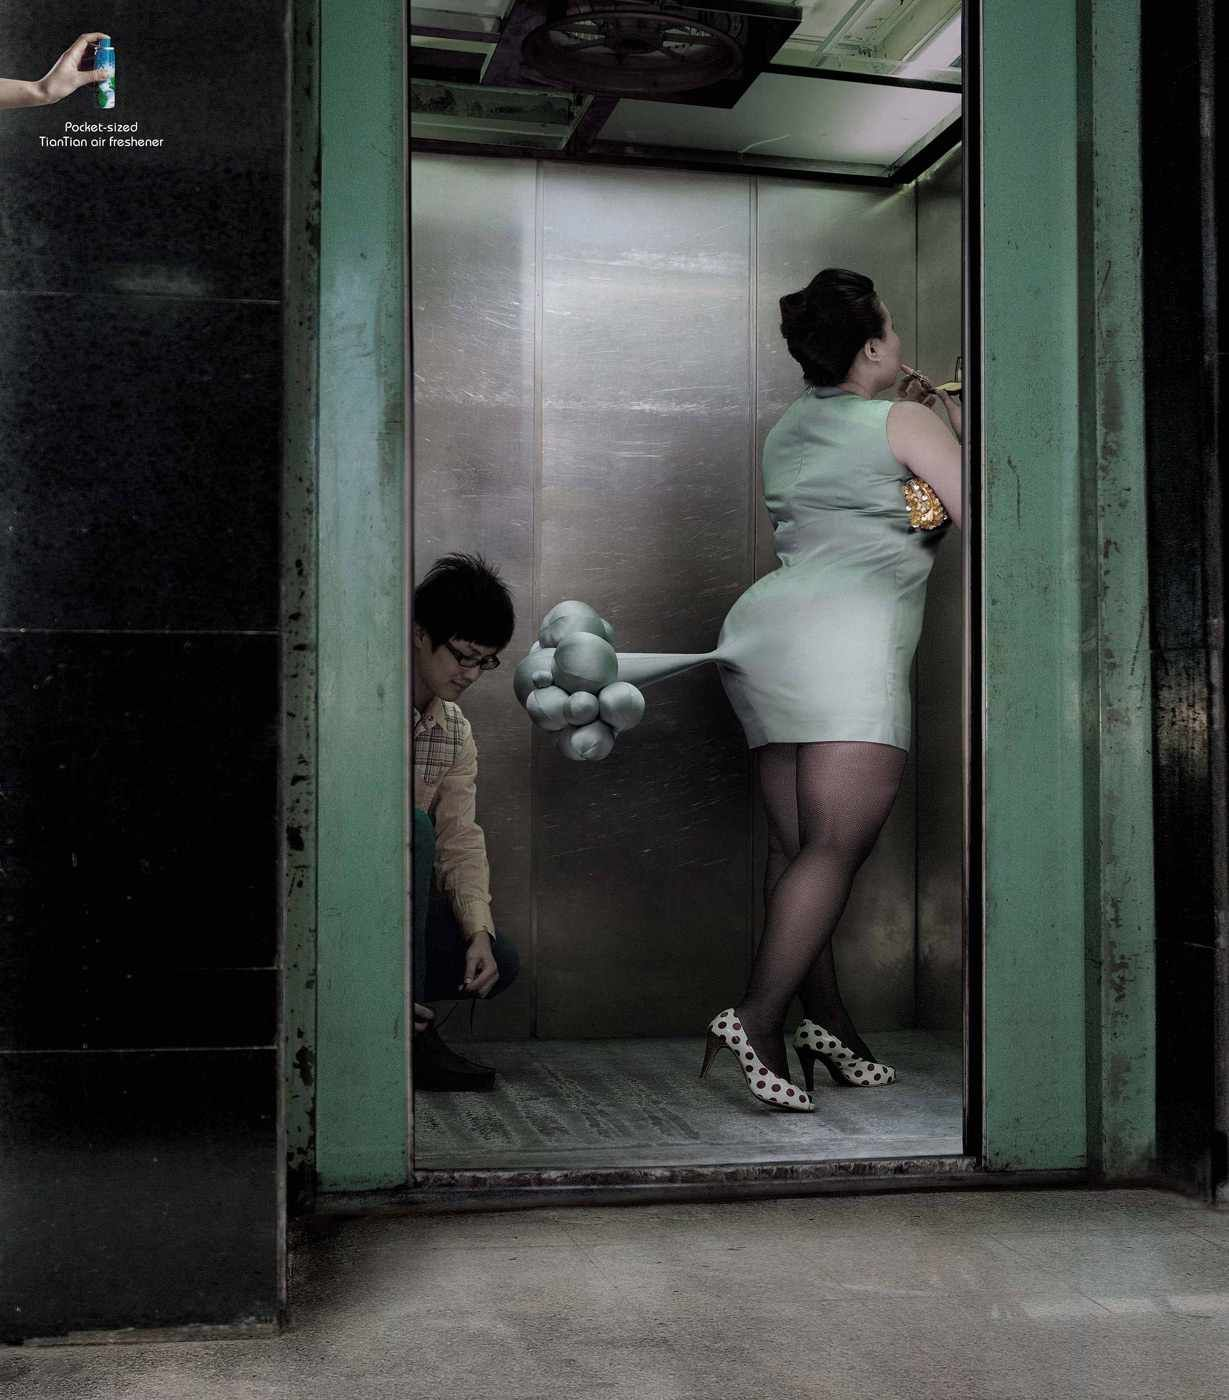 China Tiantian Elevator Pocket Sized Tiantian Air Freshener